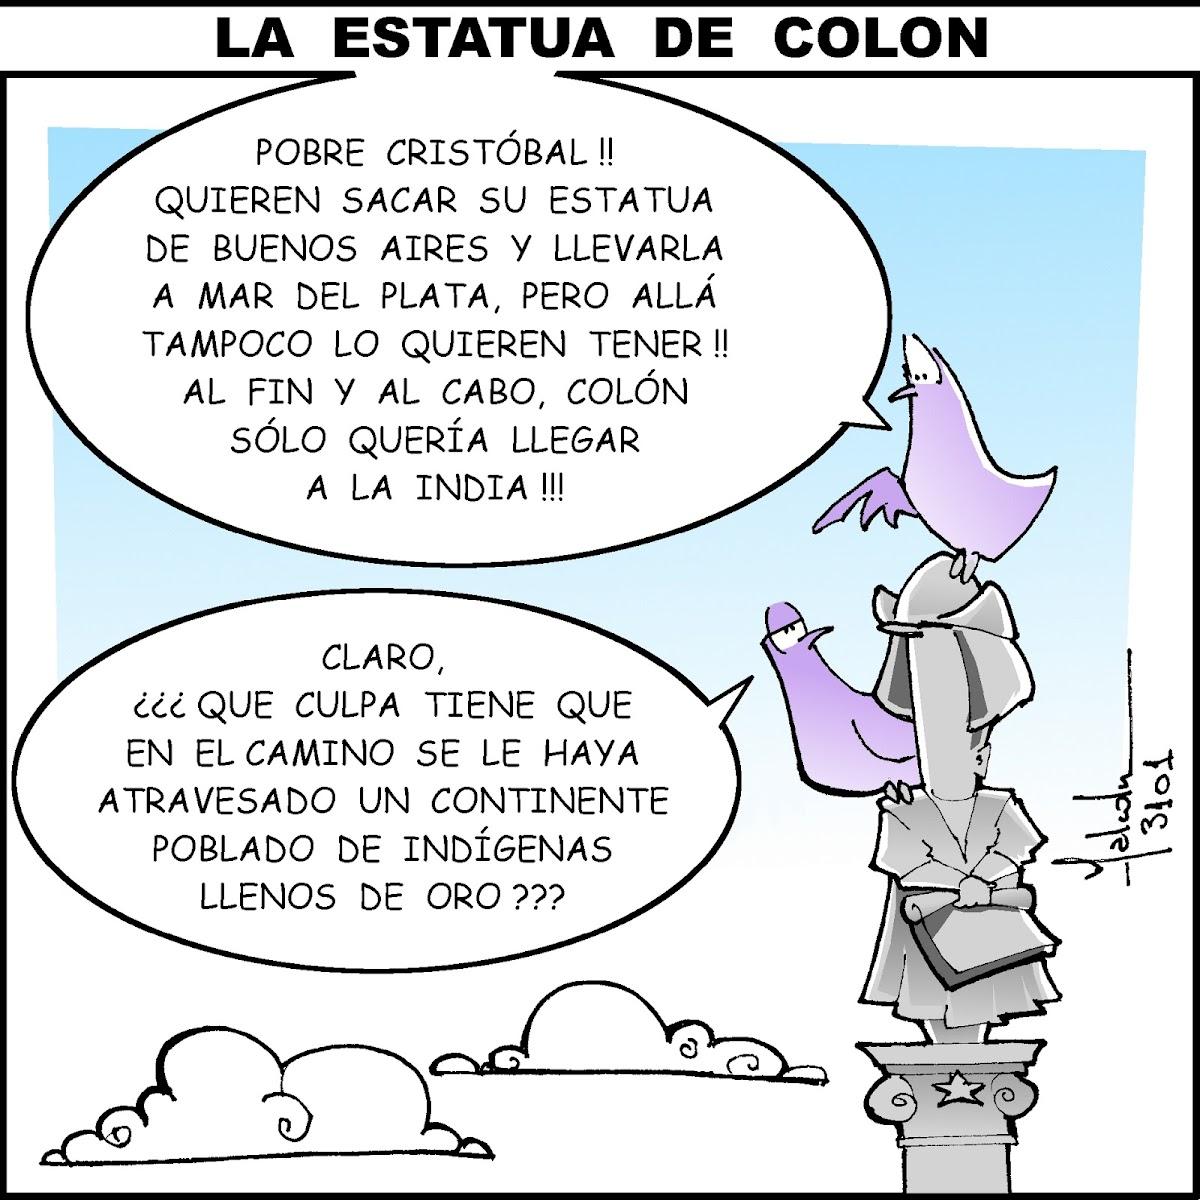 http://2.bp.blogspot.com/-GfVDmDPuWJE/UauBa9rKRhI/AAAAAAAAG0M/dagLzBXmoCQ/s1200/3101+La+estatua+de+Colon.jpg